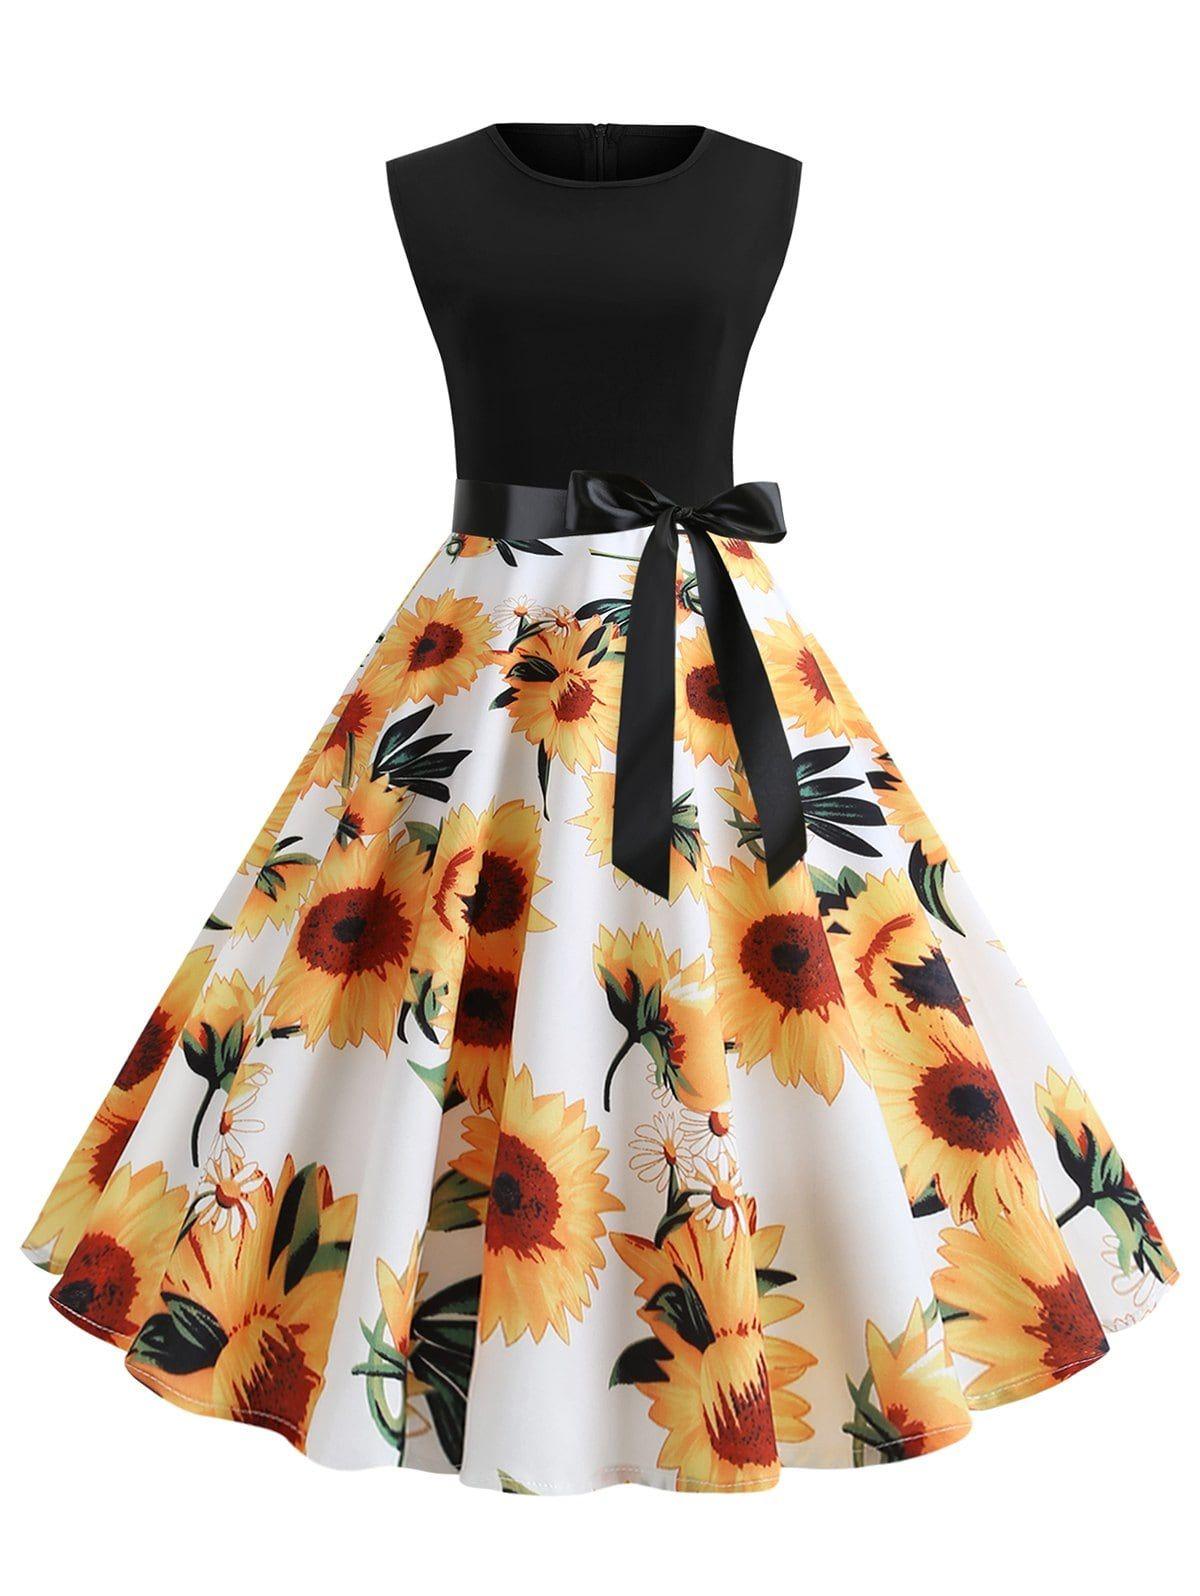 Sunflower Print Sleeveless Belted Flare Dress Sleeveless Dress Summer Womens Dresses Fashion Dresses [ 1596 x 1200 Pixel ]